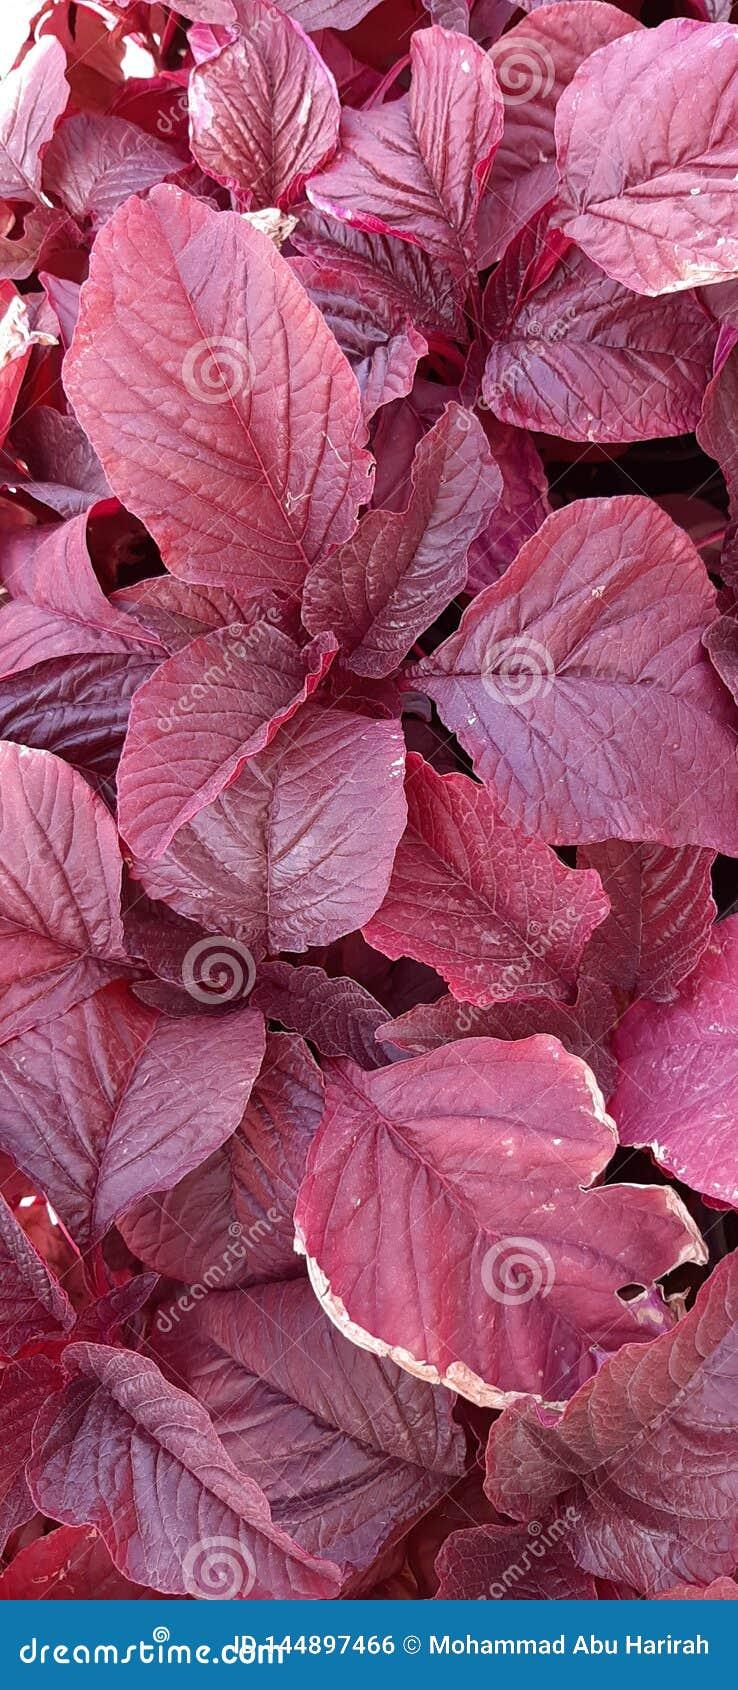 Blad van bloem rode kleur